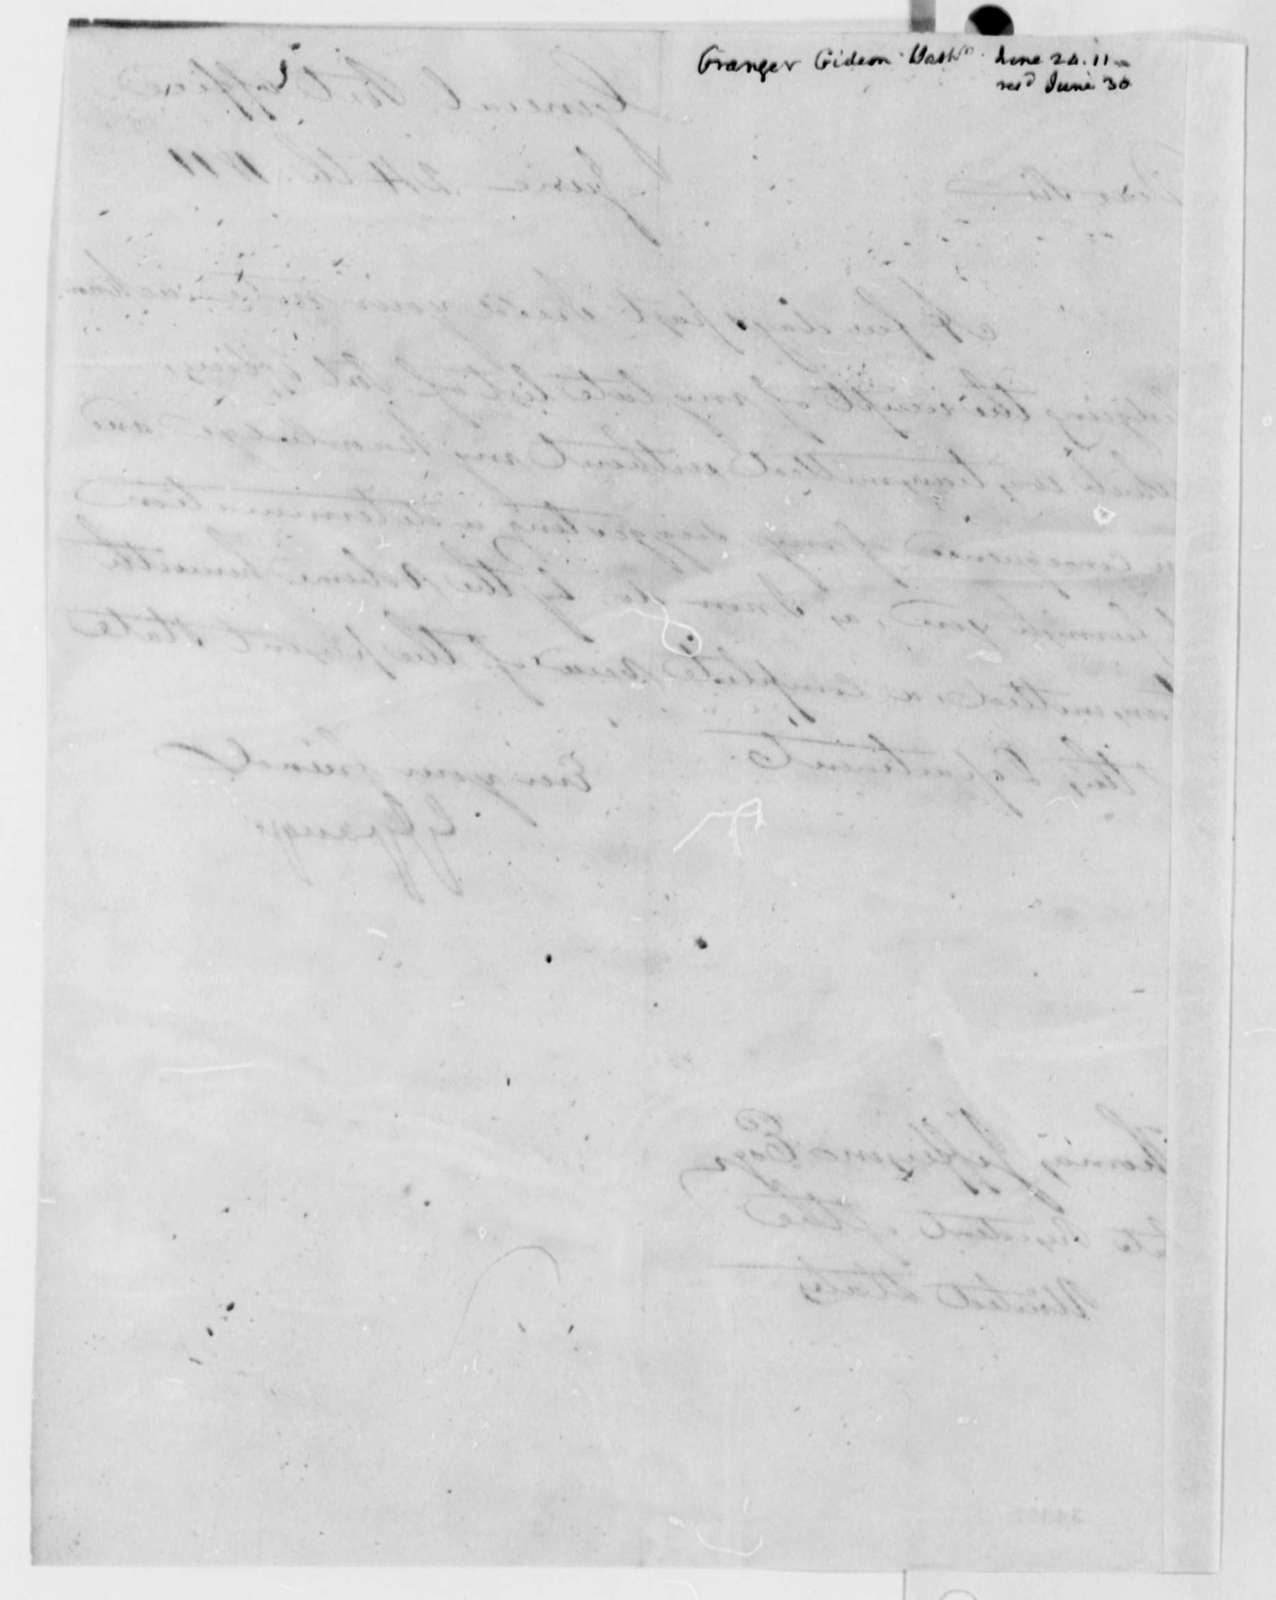 Gideon Granger to Thomas Jefferson, June 24, 1811